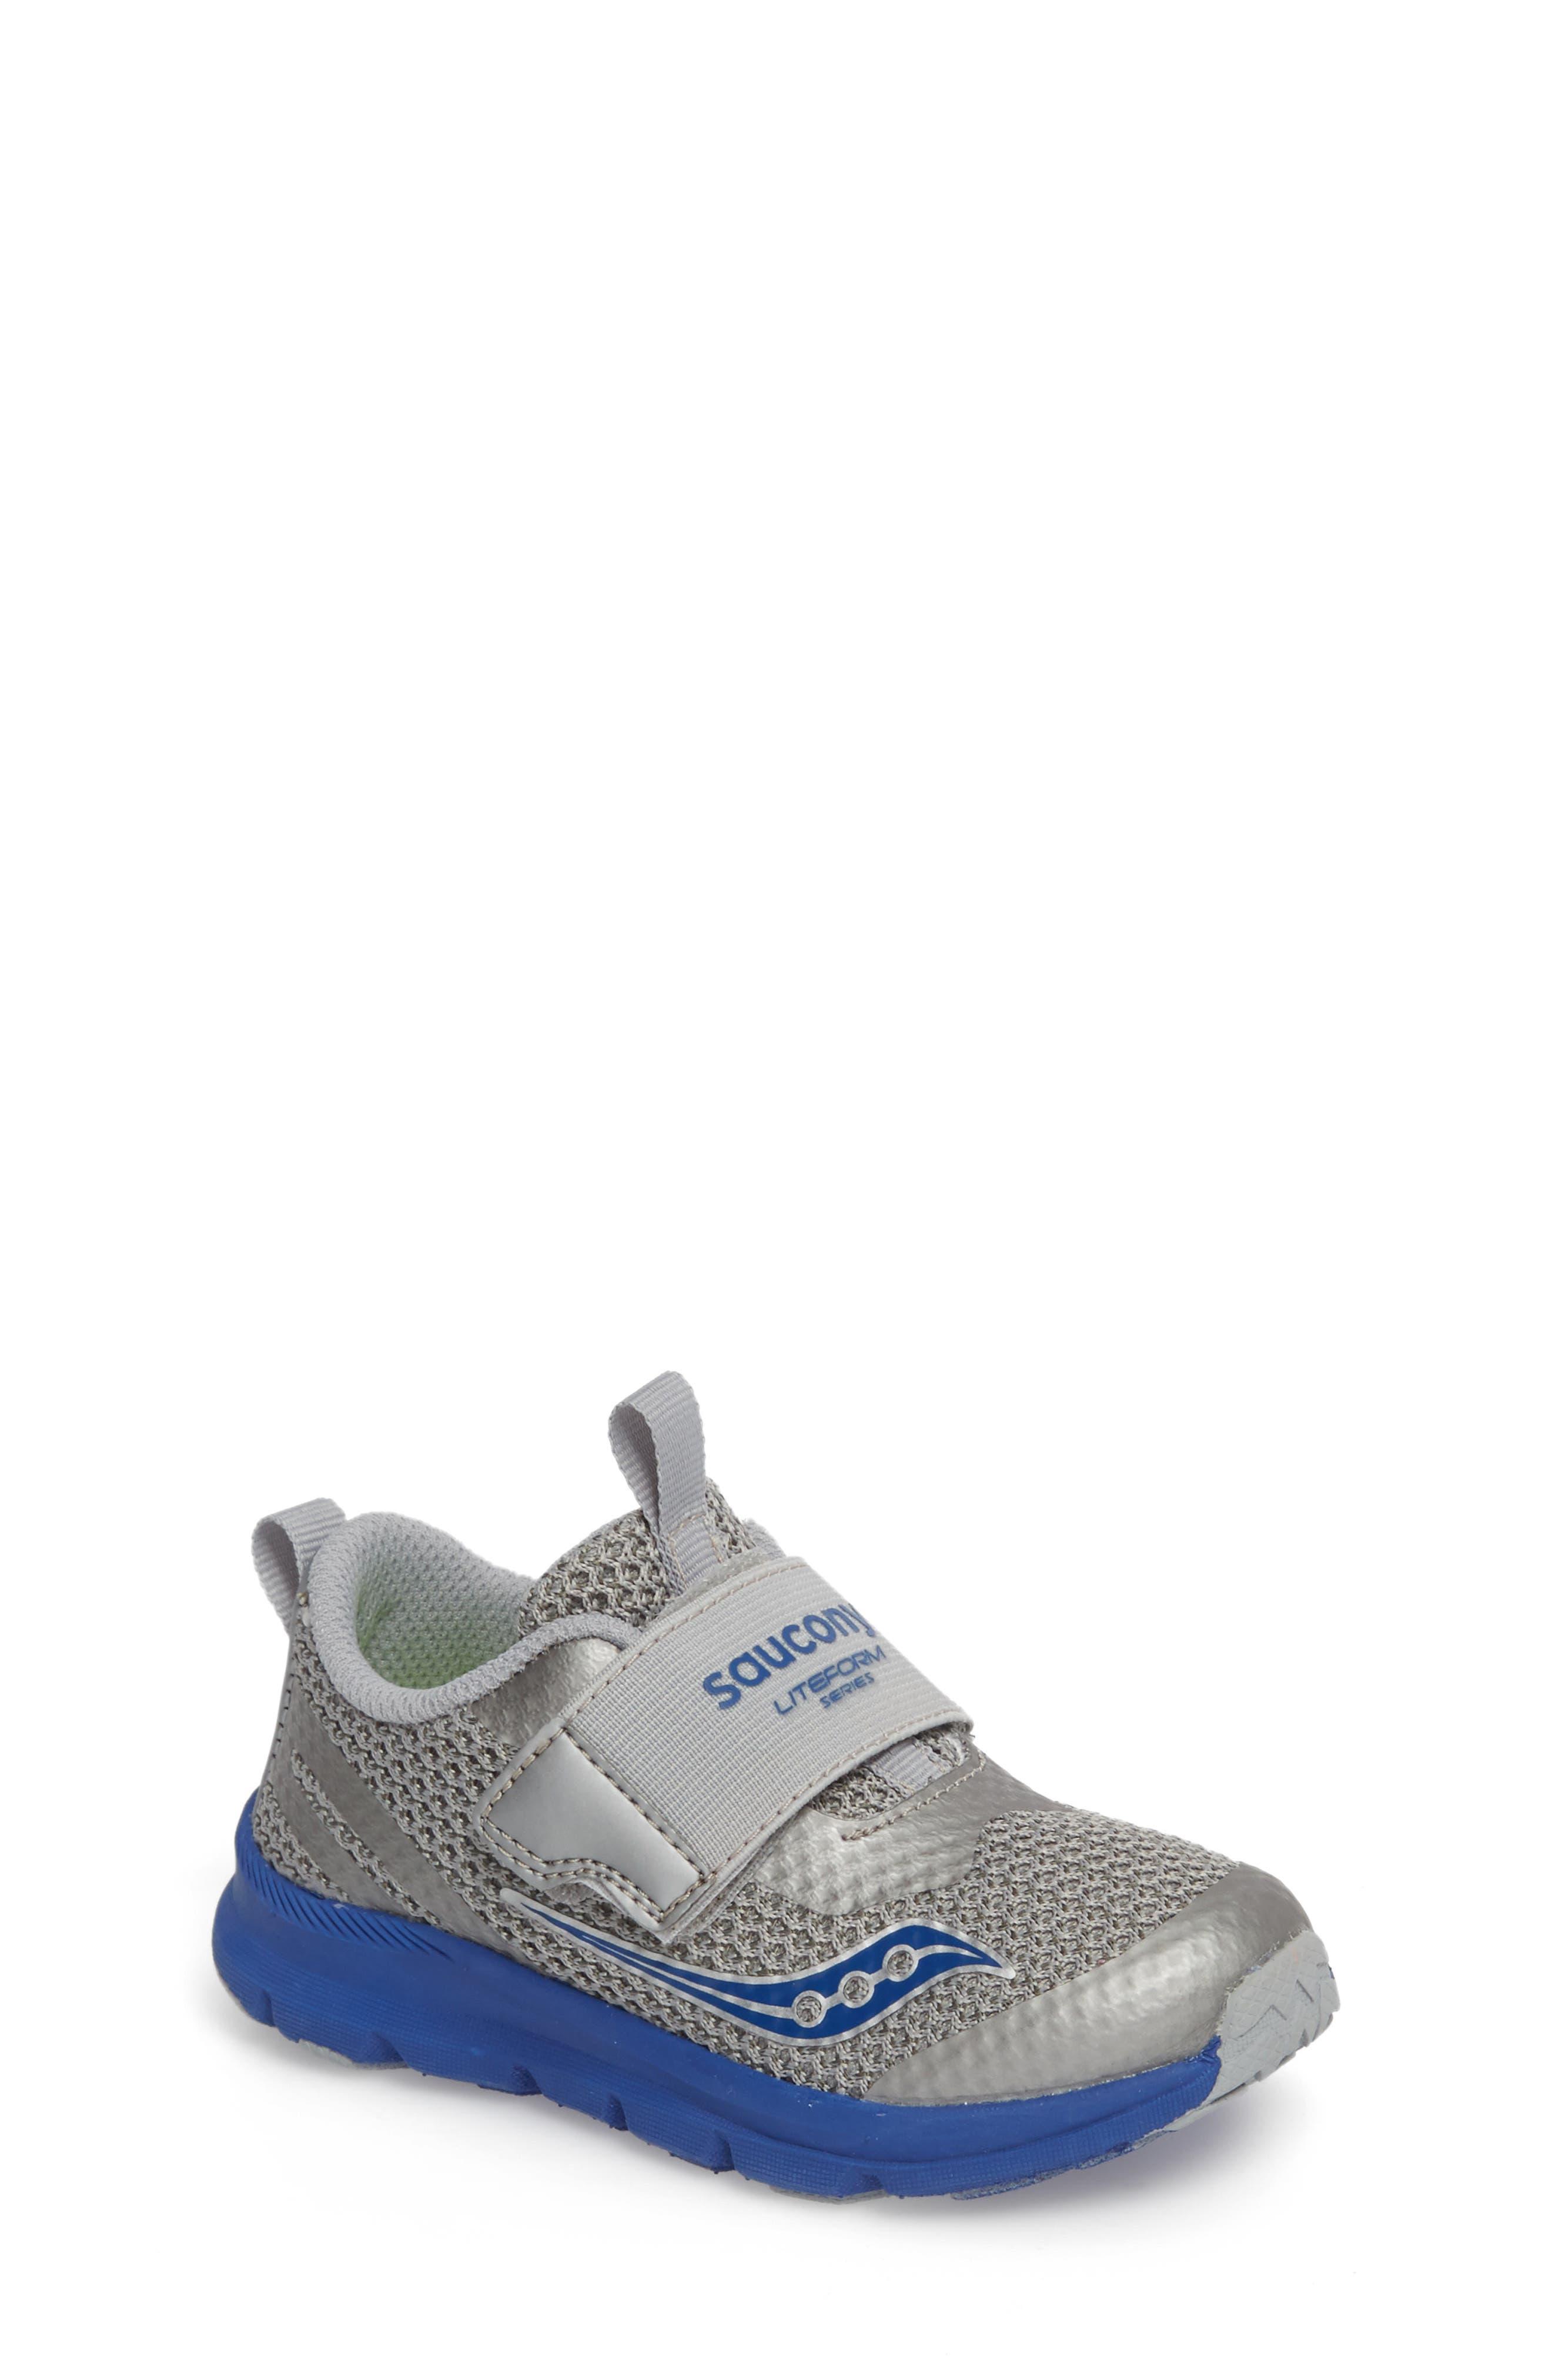 Baby Liteform Sneaker,                         Main,                         color, Grey/ Blue